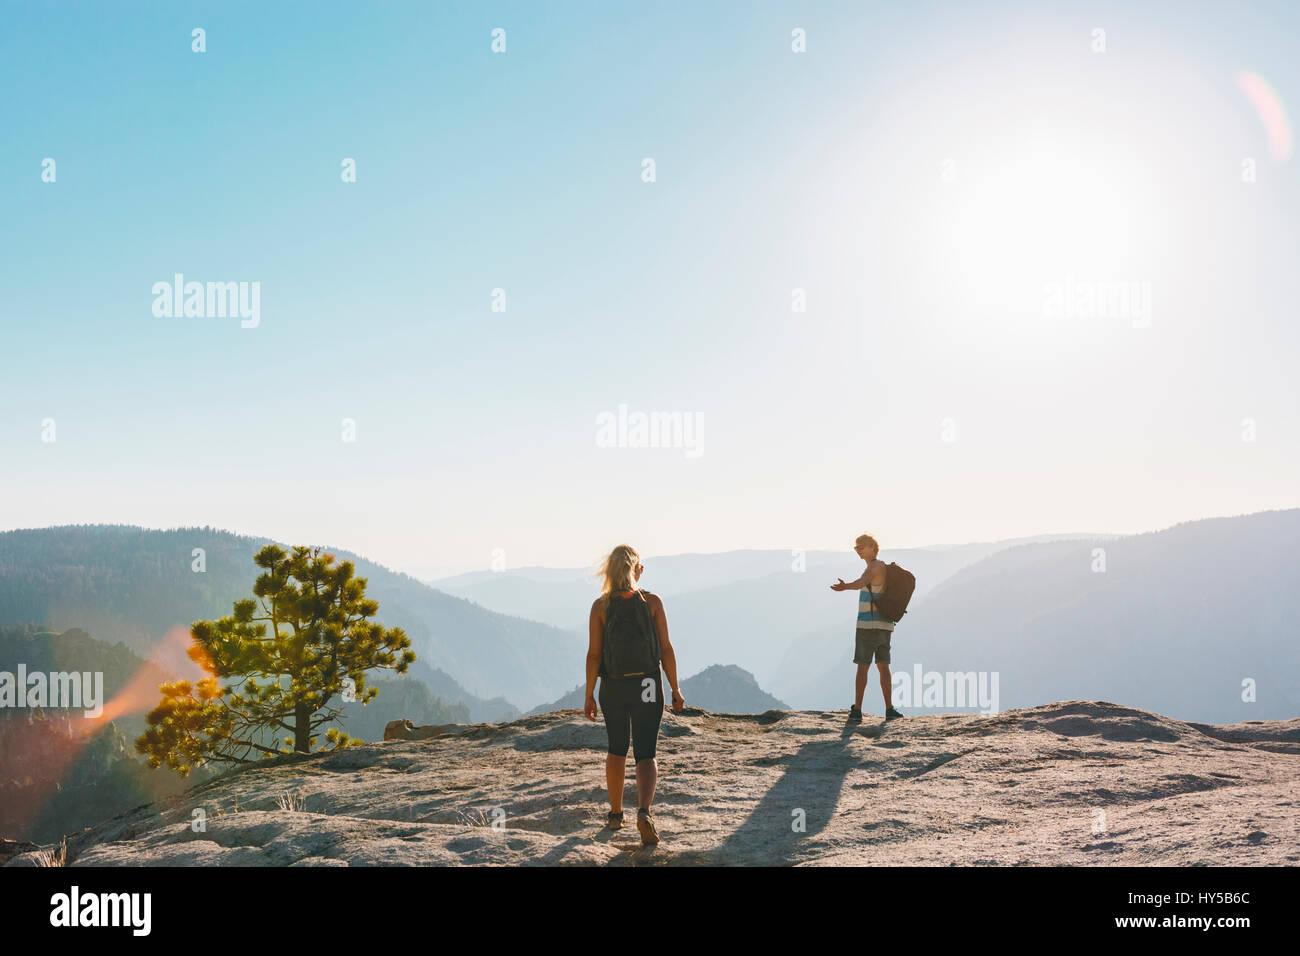 USA, California, Yosemite National Park, Man and woman at Taft Point - Stock Image